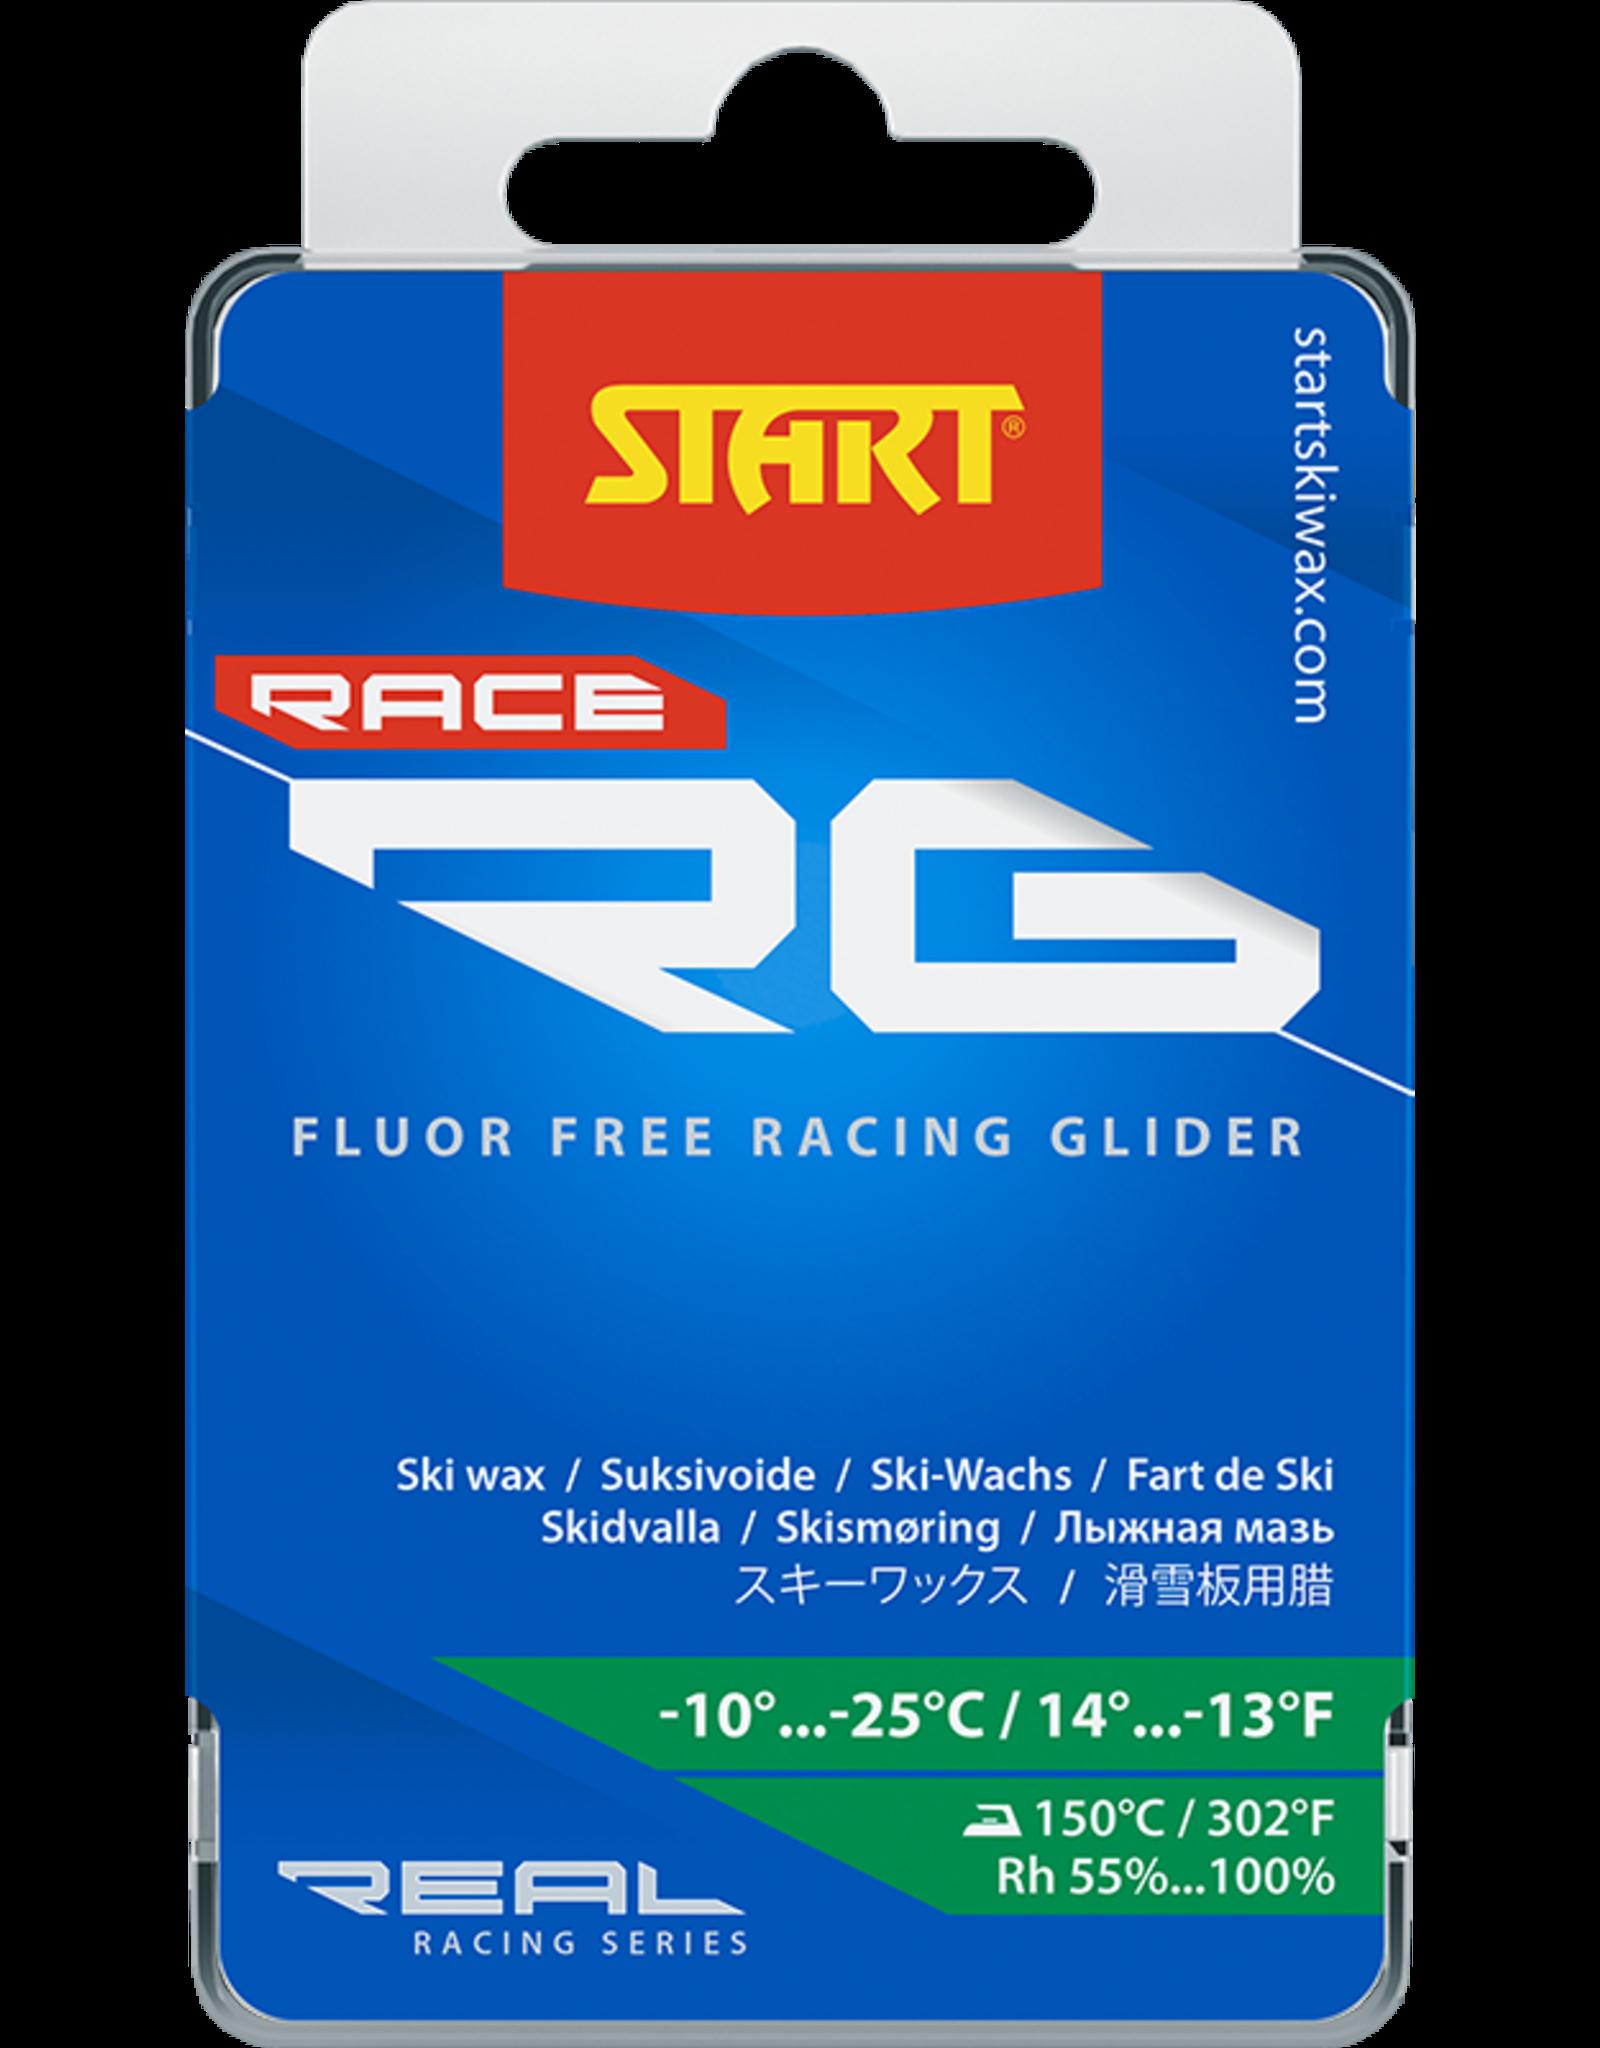 Start RG Race Glider Green 60g